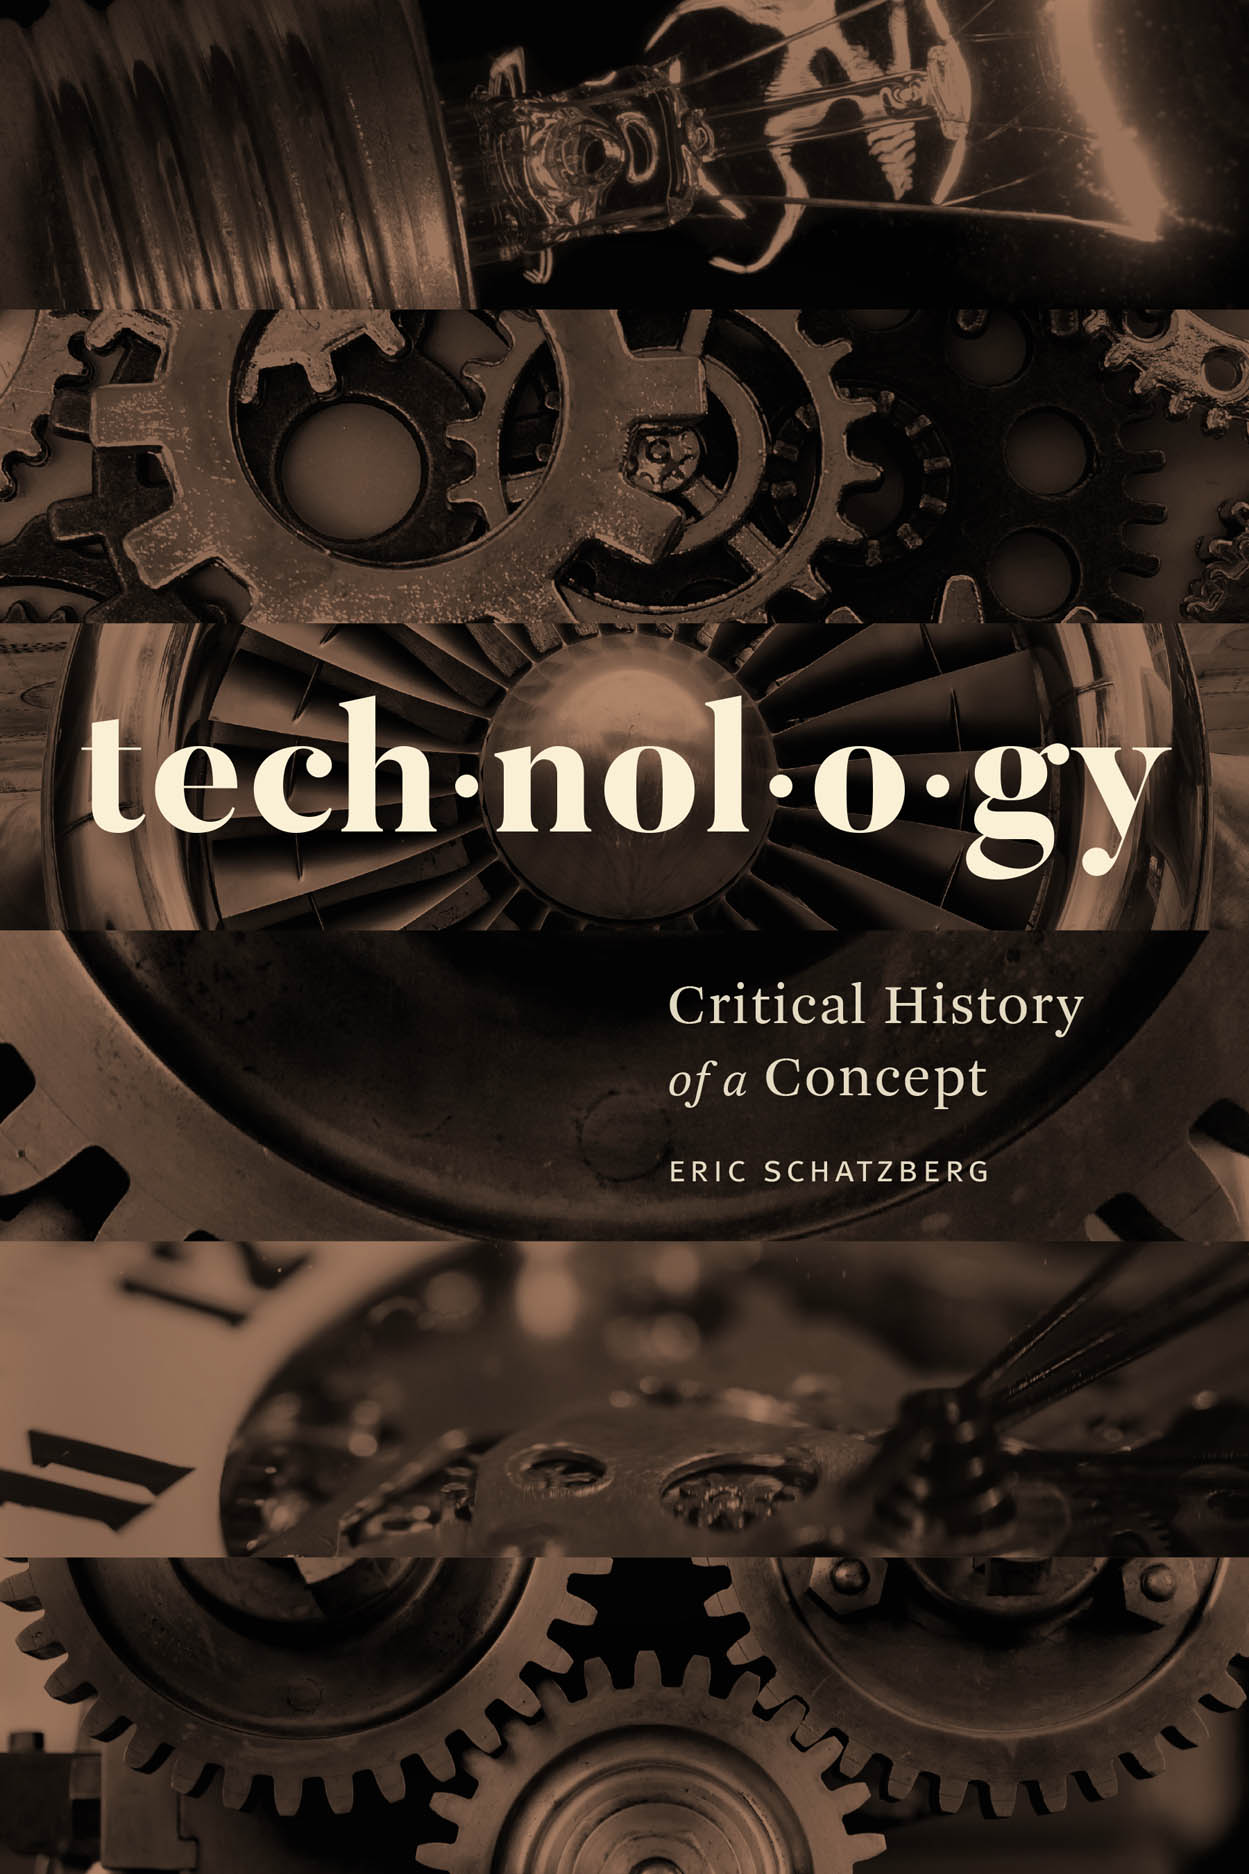 Technology: Critical History of a Concept, Schatzberg